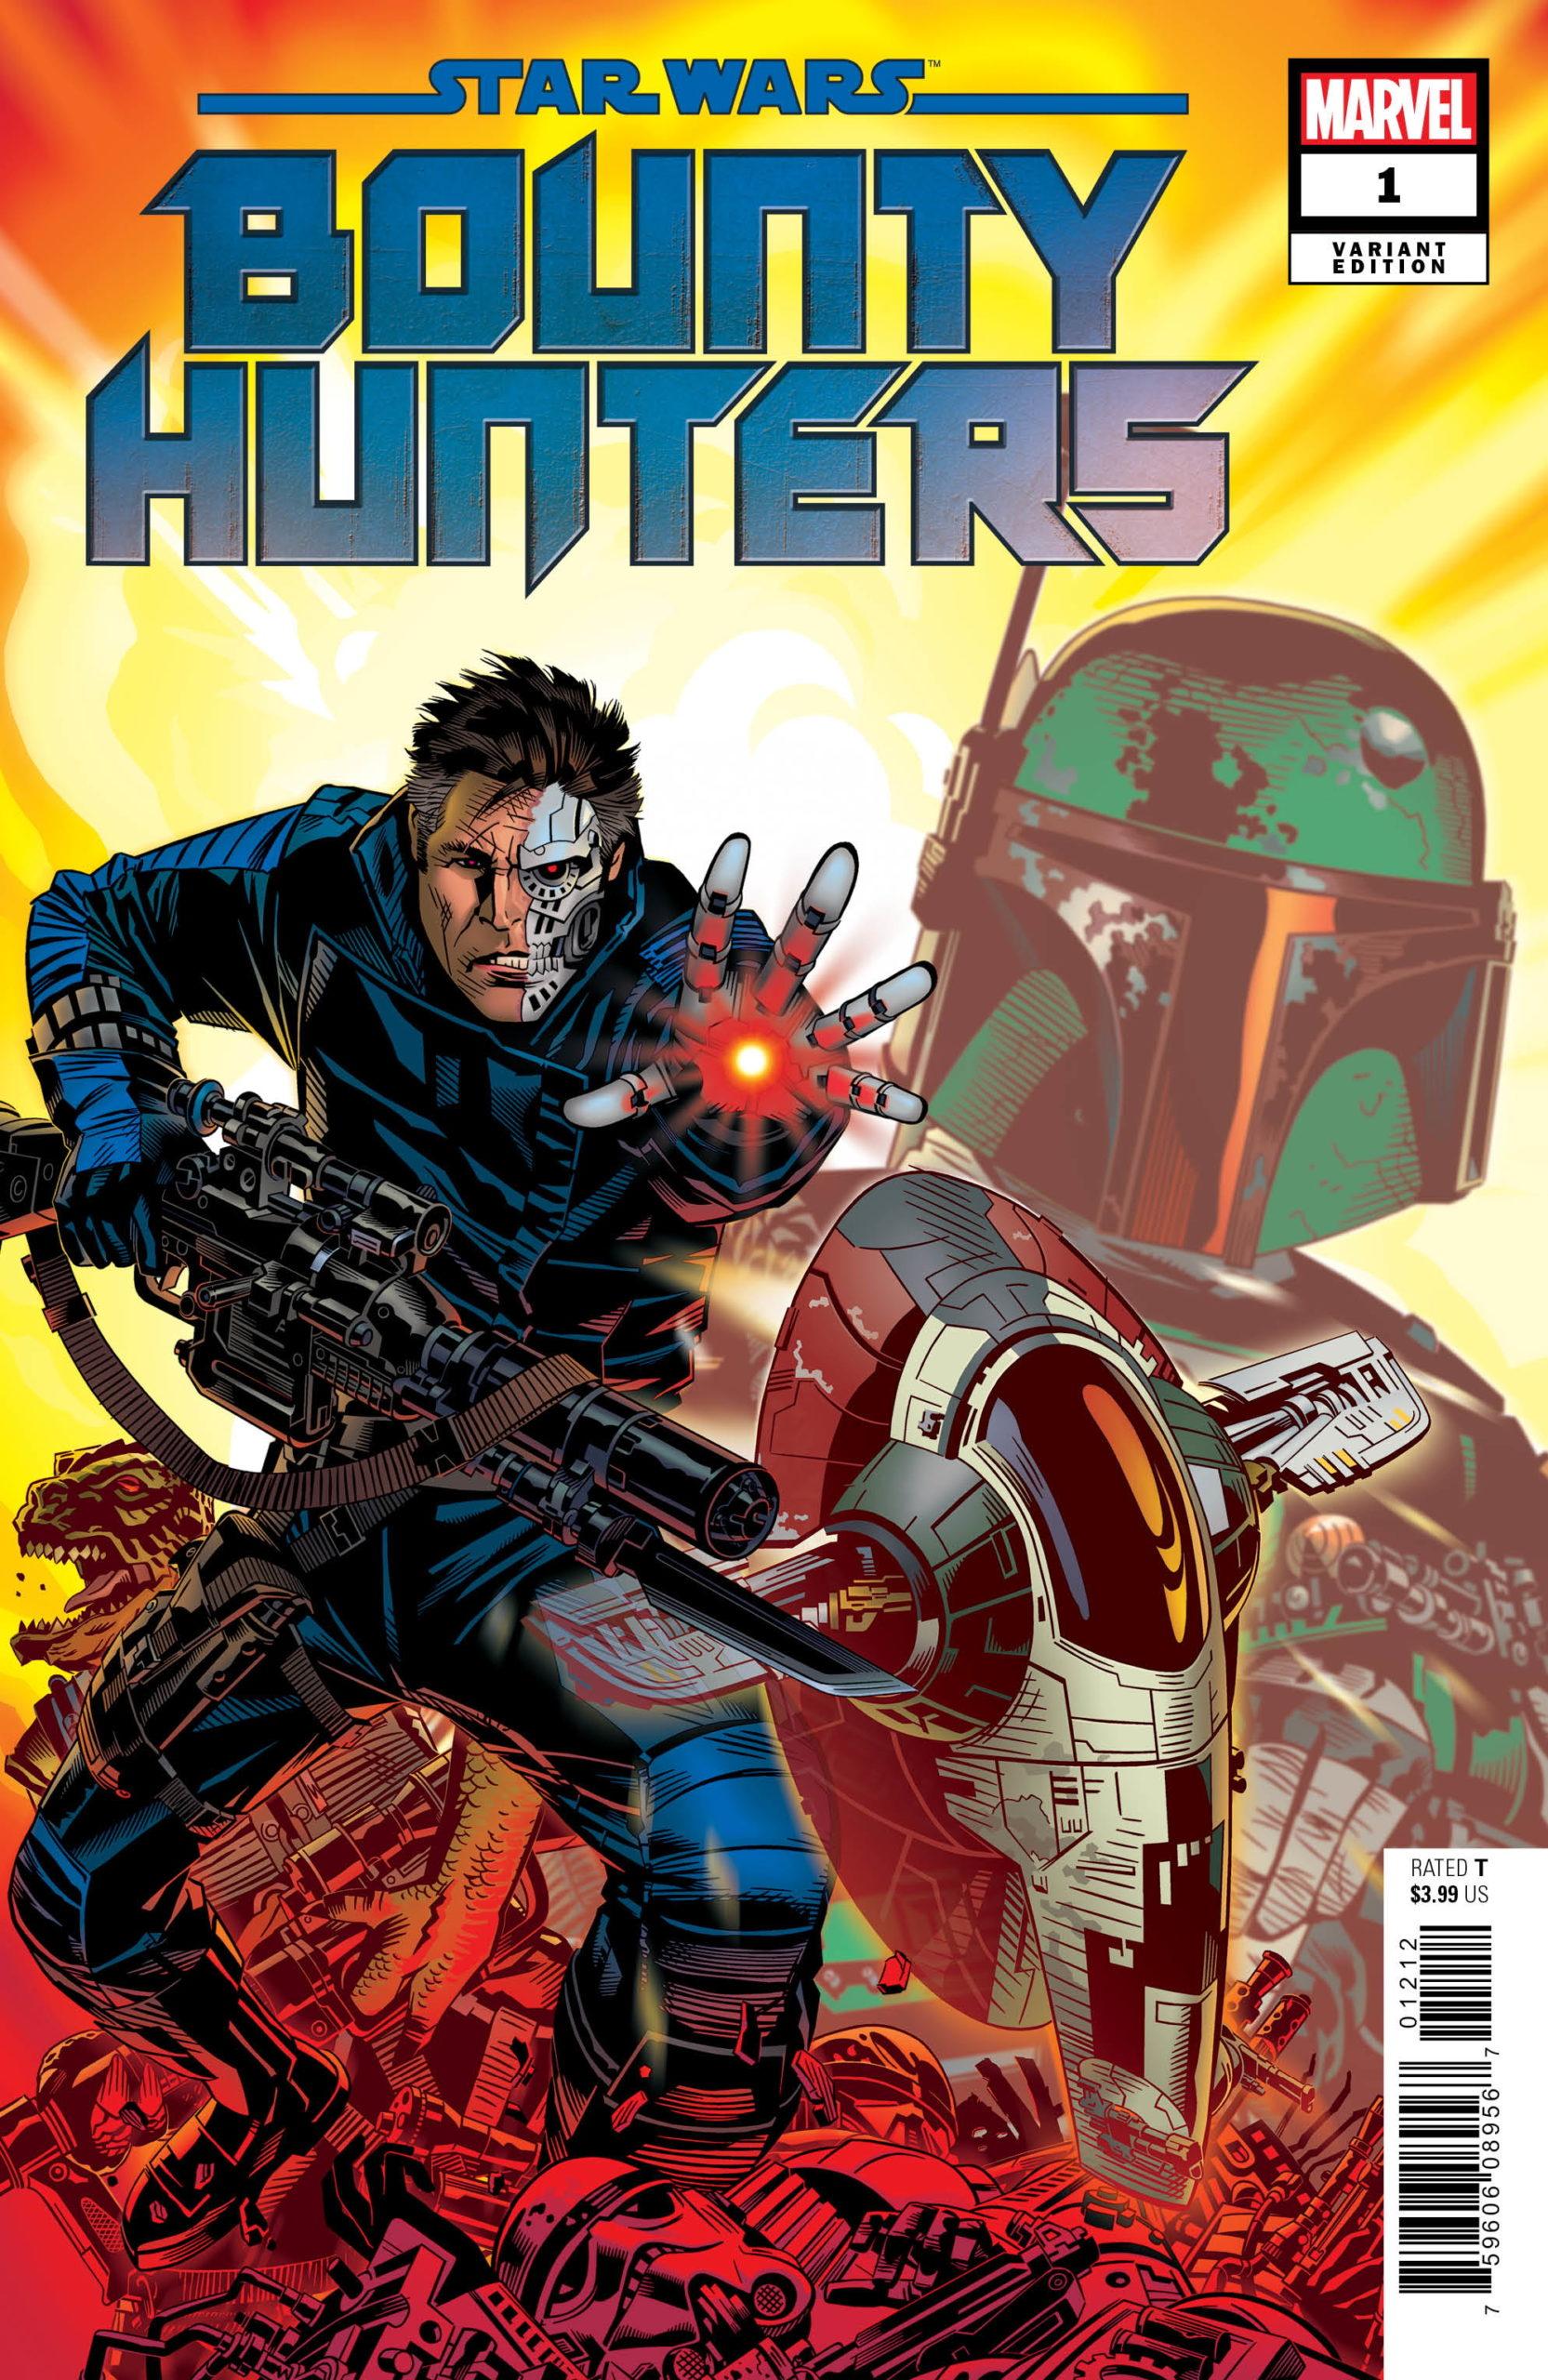 Bounty Hunters #1 (Michael Golden Variant Cover) (11.03.2020)